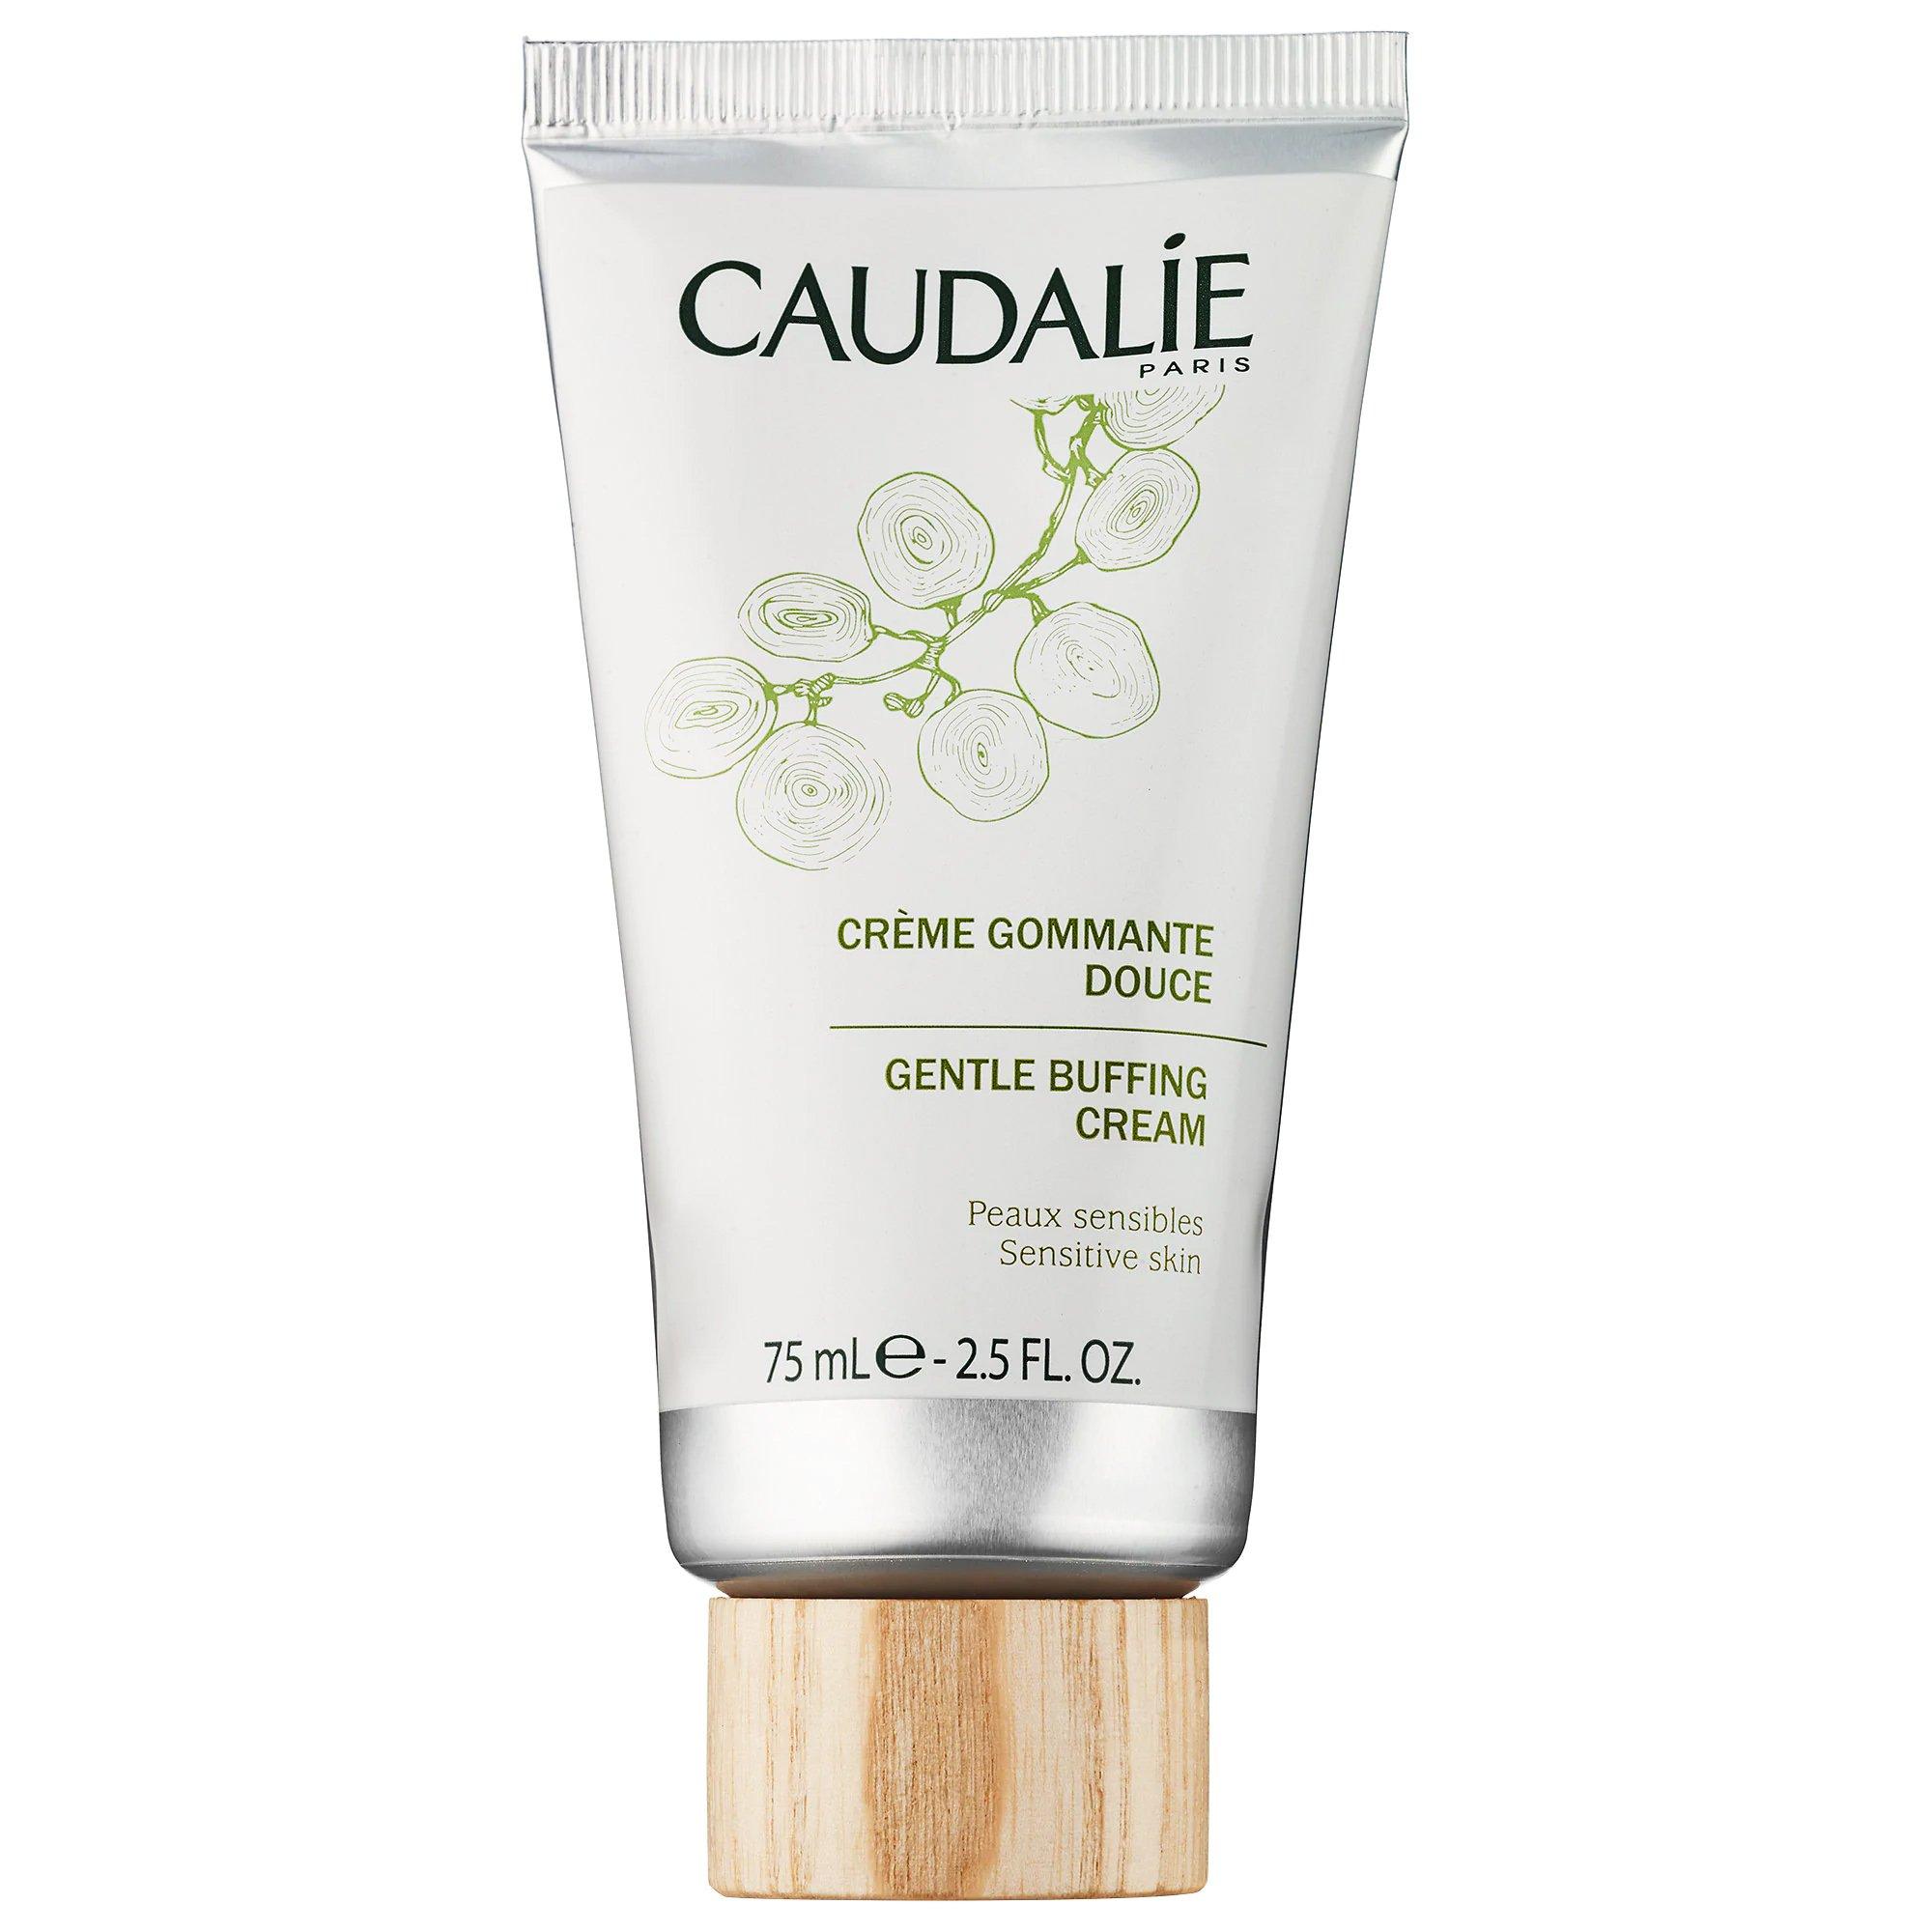 Caudalie Gentle Buffing Cream Απαλή Κρέμα Καθαρισμού Προσώπου Ήπιας Απολέπισης 75ml